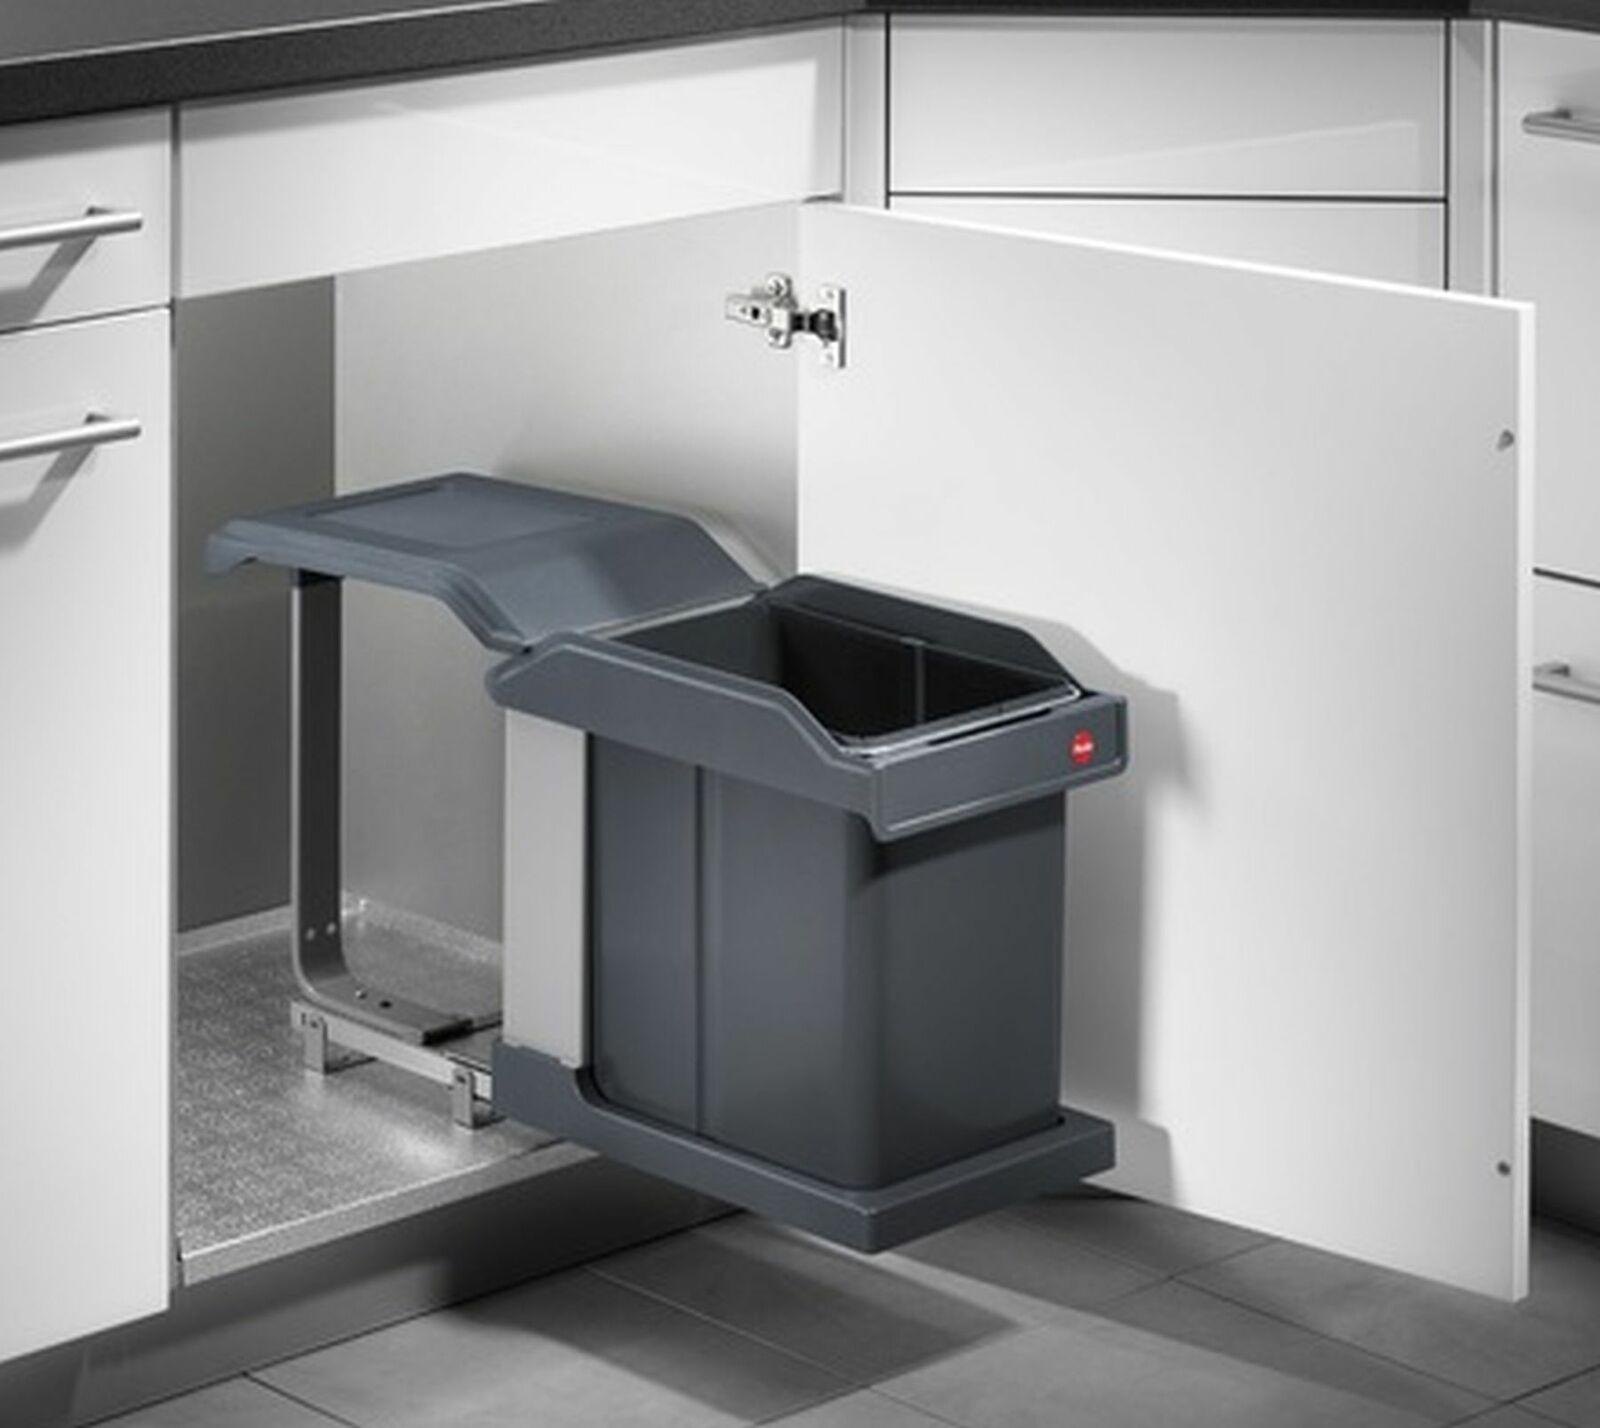 Einbau Mülleimer Küche 20 L Vollauszug Ausfahrautomatik Hailo Solo ...